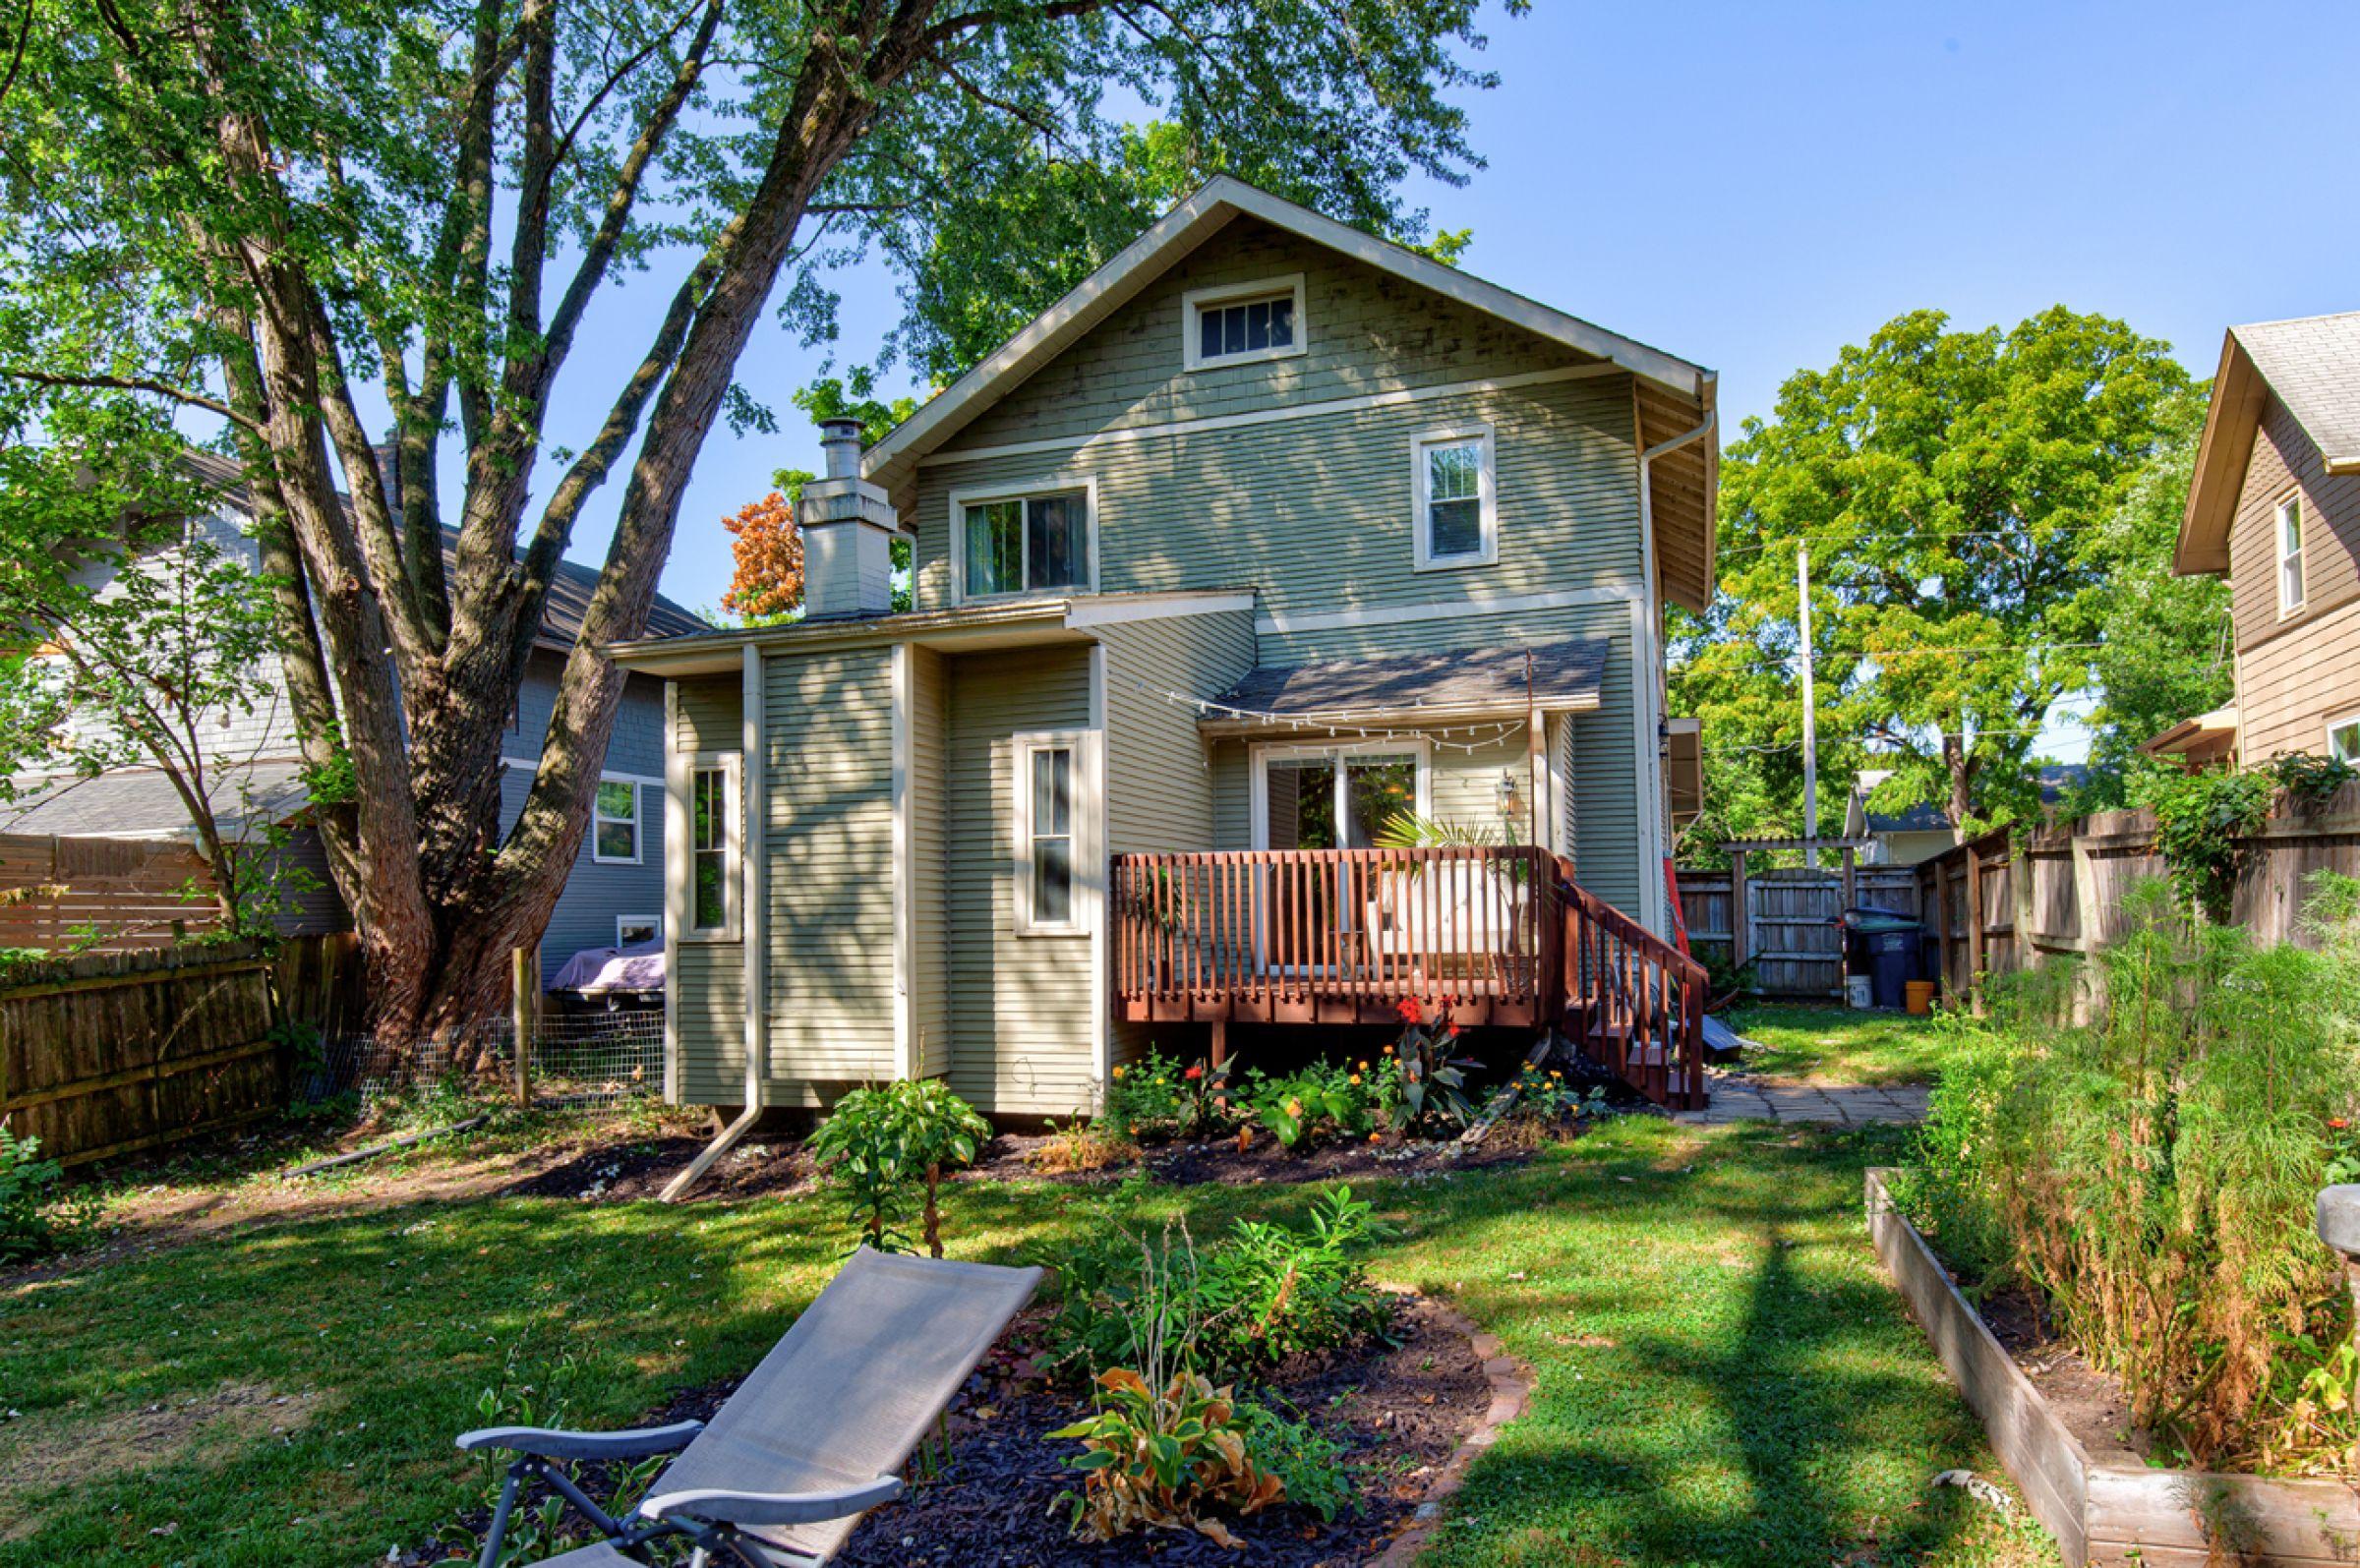 residential-polk-county-iowa-0-acres-listing-number-15153-3-2020-09-02-232351.jpg